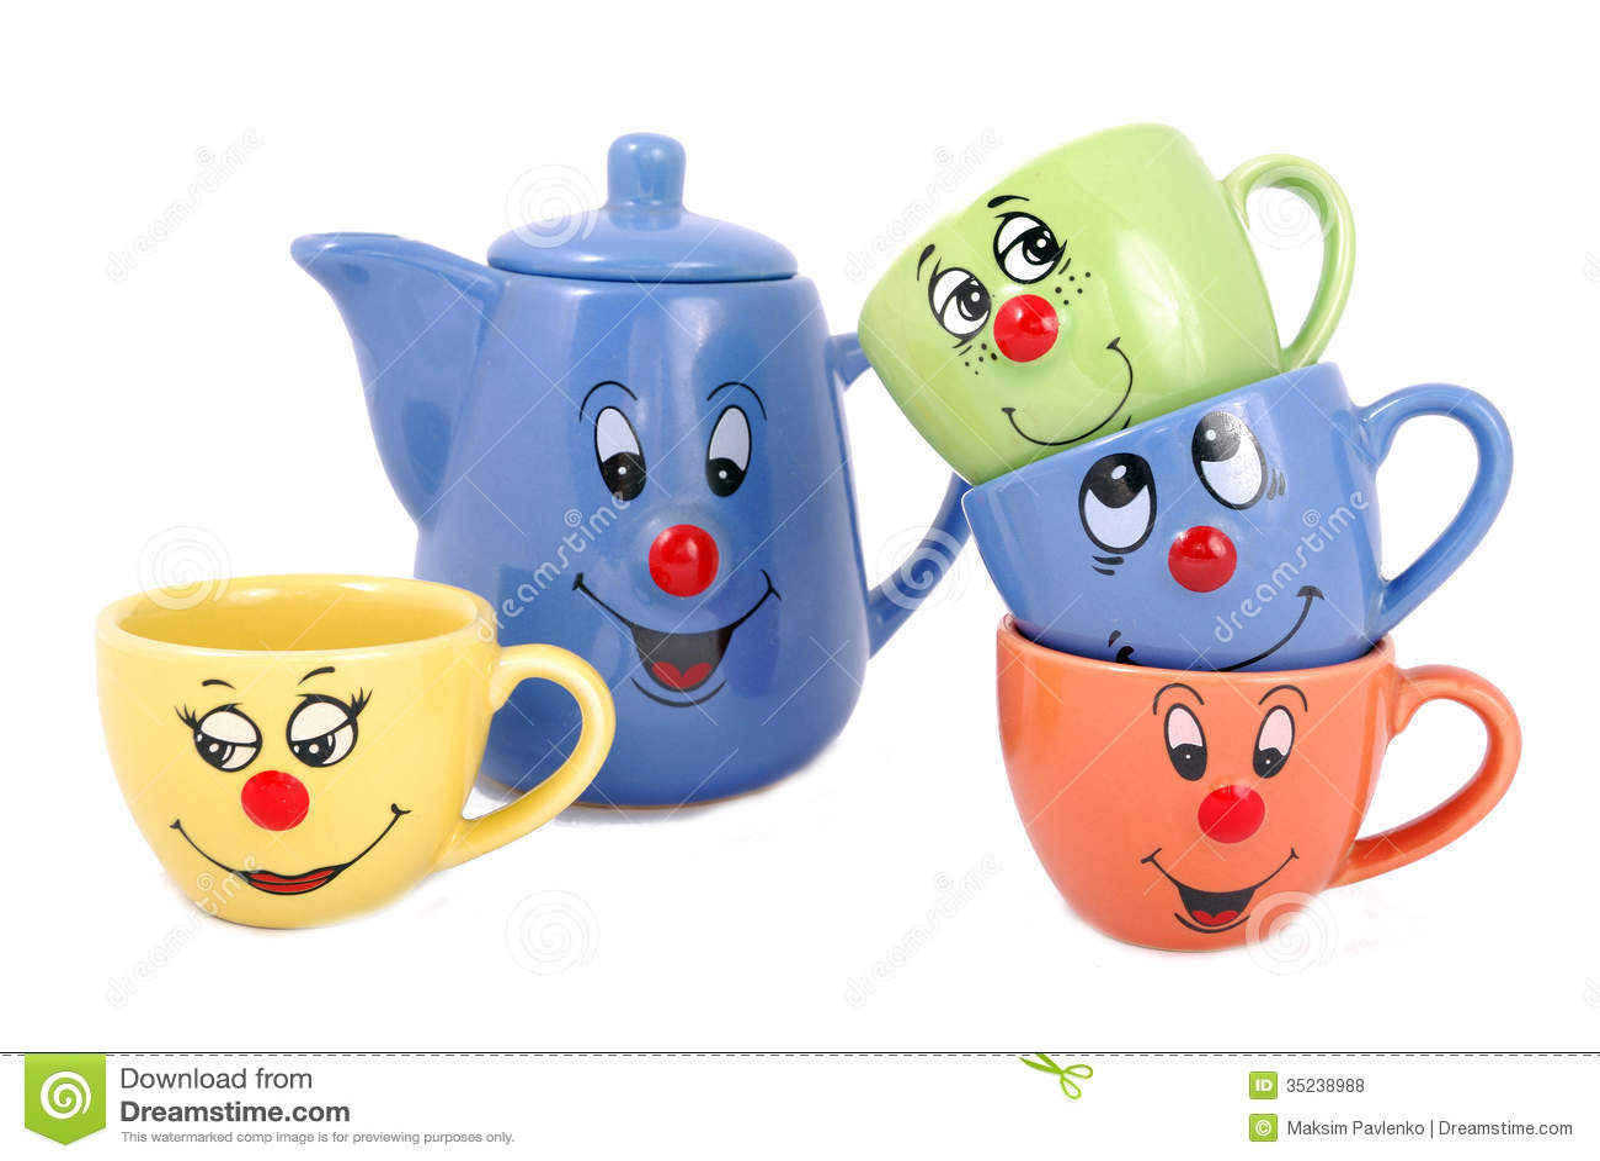 tea mugs and coffee cups royalty free stock photos image